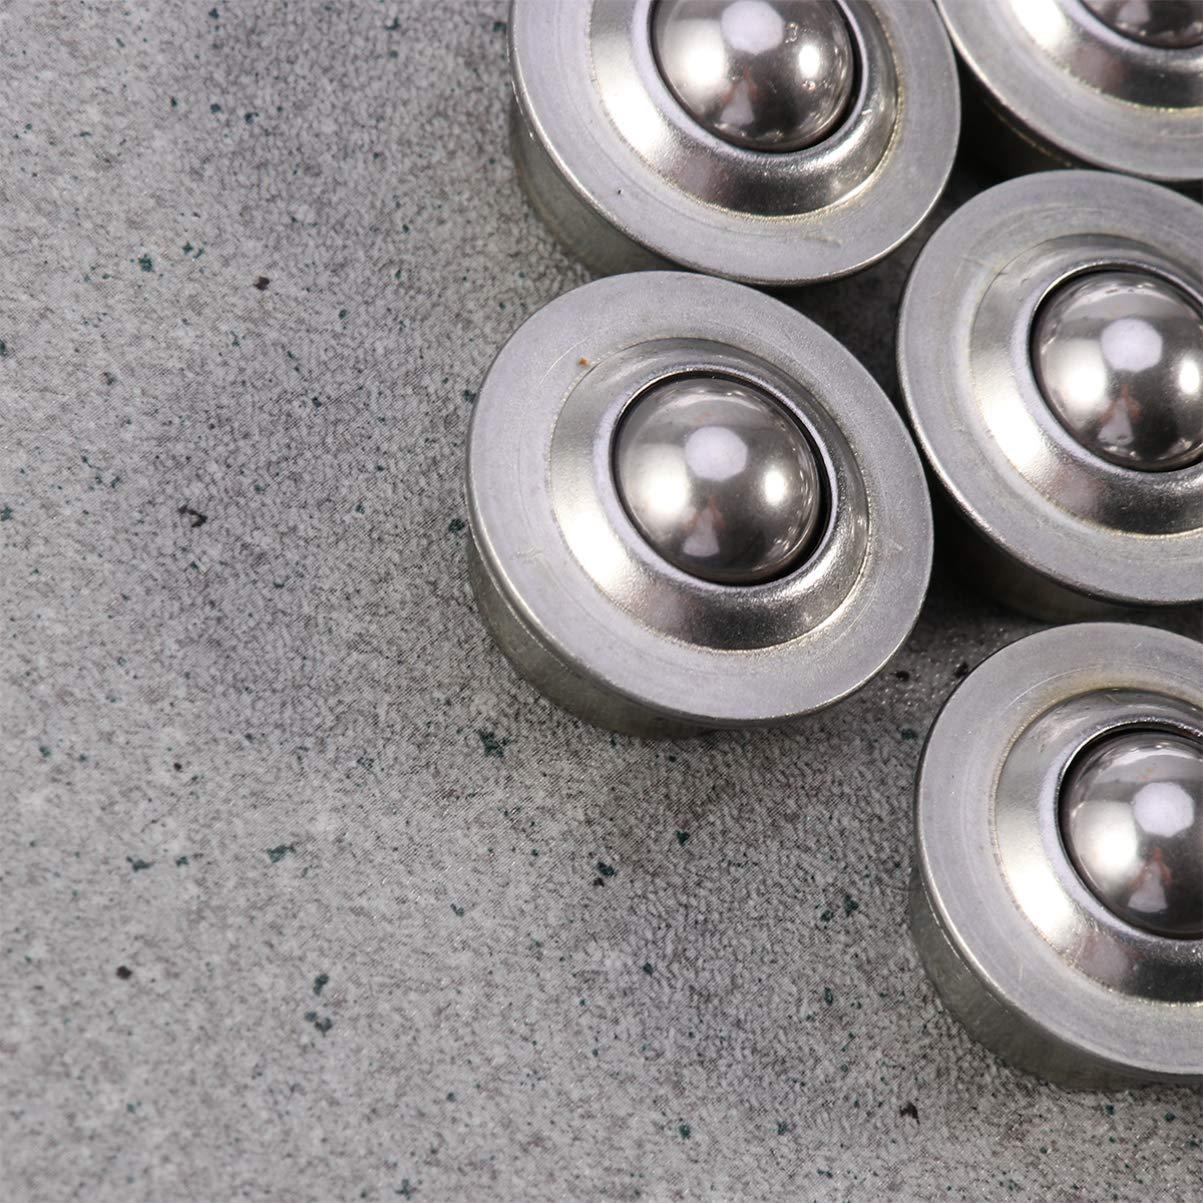 VILLCASE Ball Transfer Bearing-10pcs Stainless Steel Universal Base Metal Ball Bearing Casters Wheel Mounted Bearing Transfer Bearings for Transmission Wheelchair Furniture